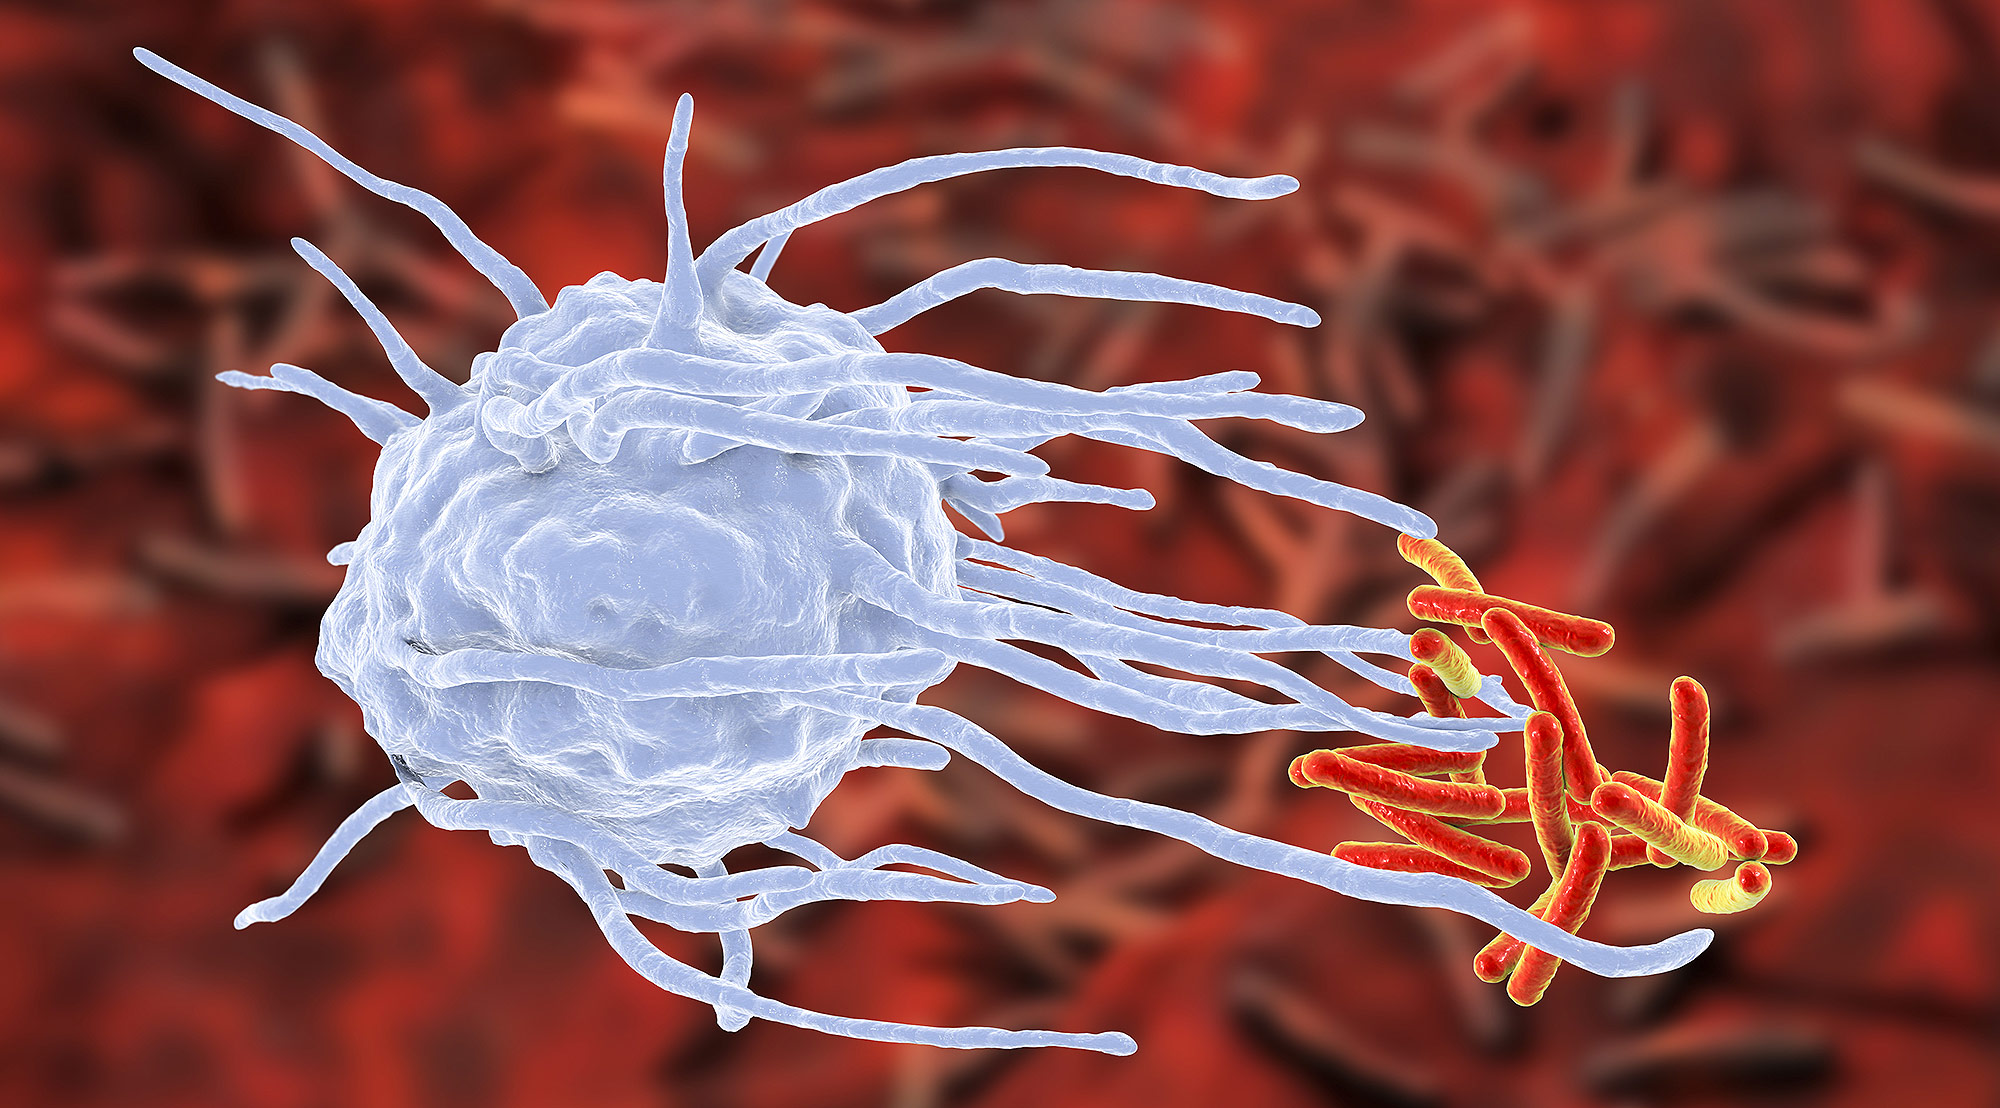 Dieta e sistema immunitario, i nutrienti per difese immunitarie efficienti